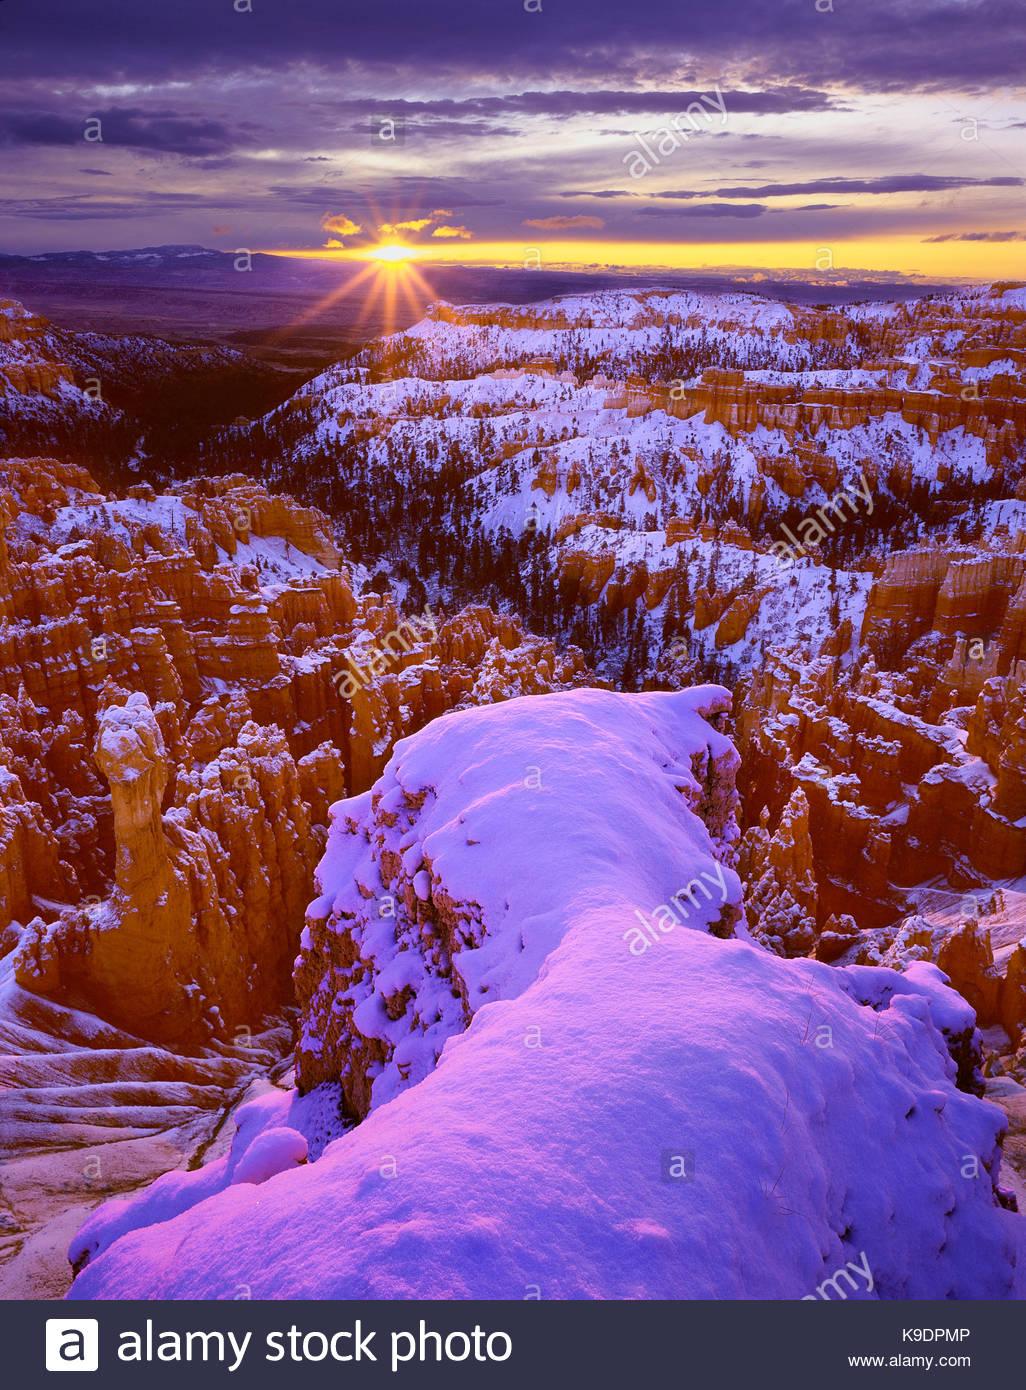 Sonnenaufgang in der Nähe von Inspiration Point, Bryce Canyon National Park, Utah Stockbild